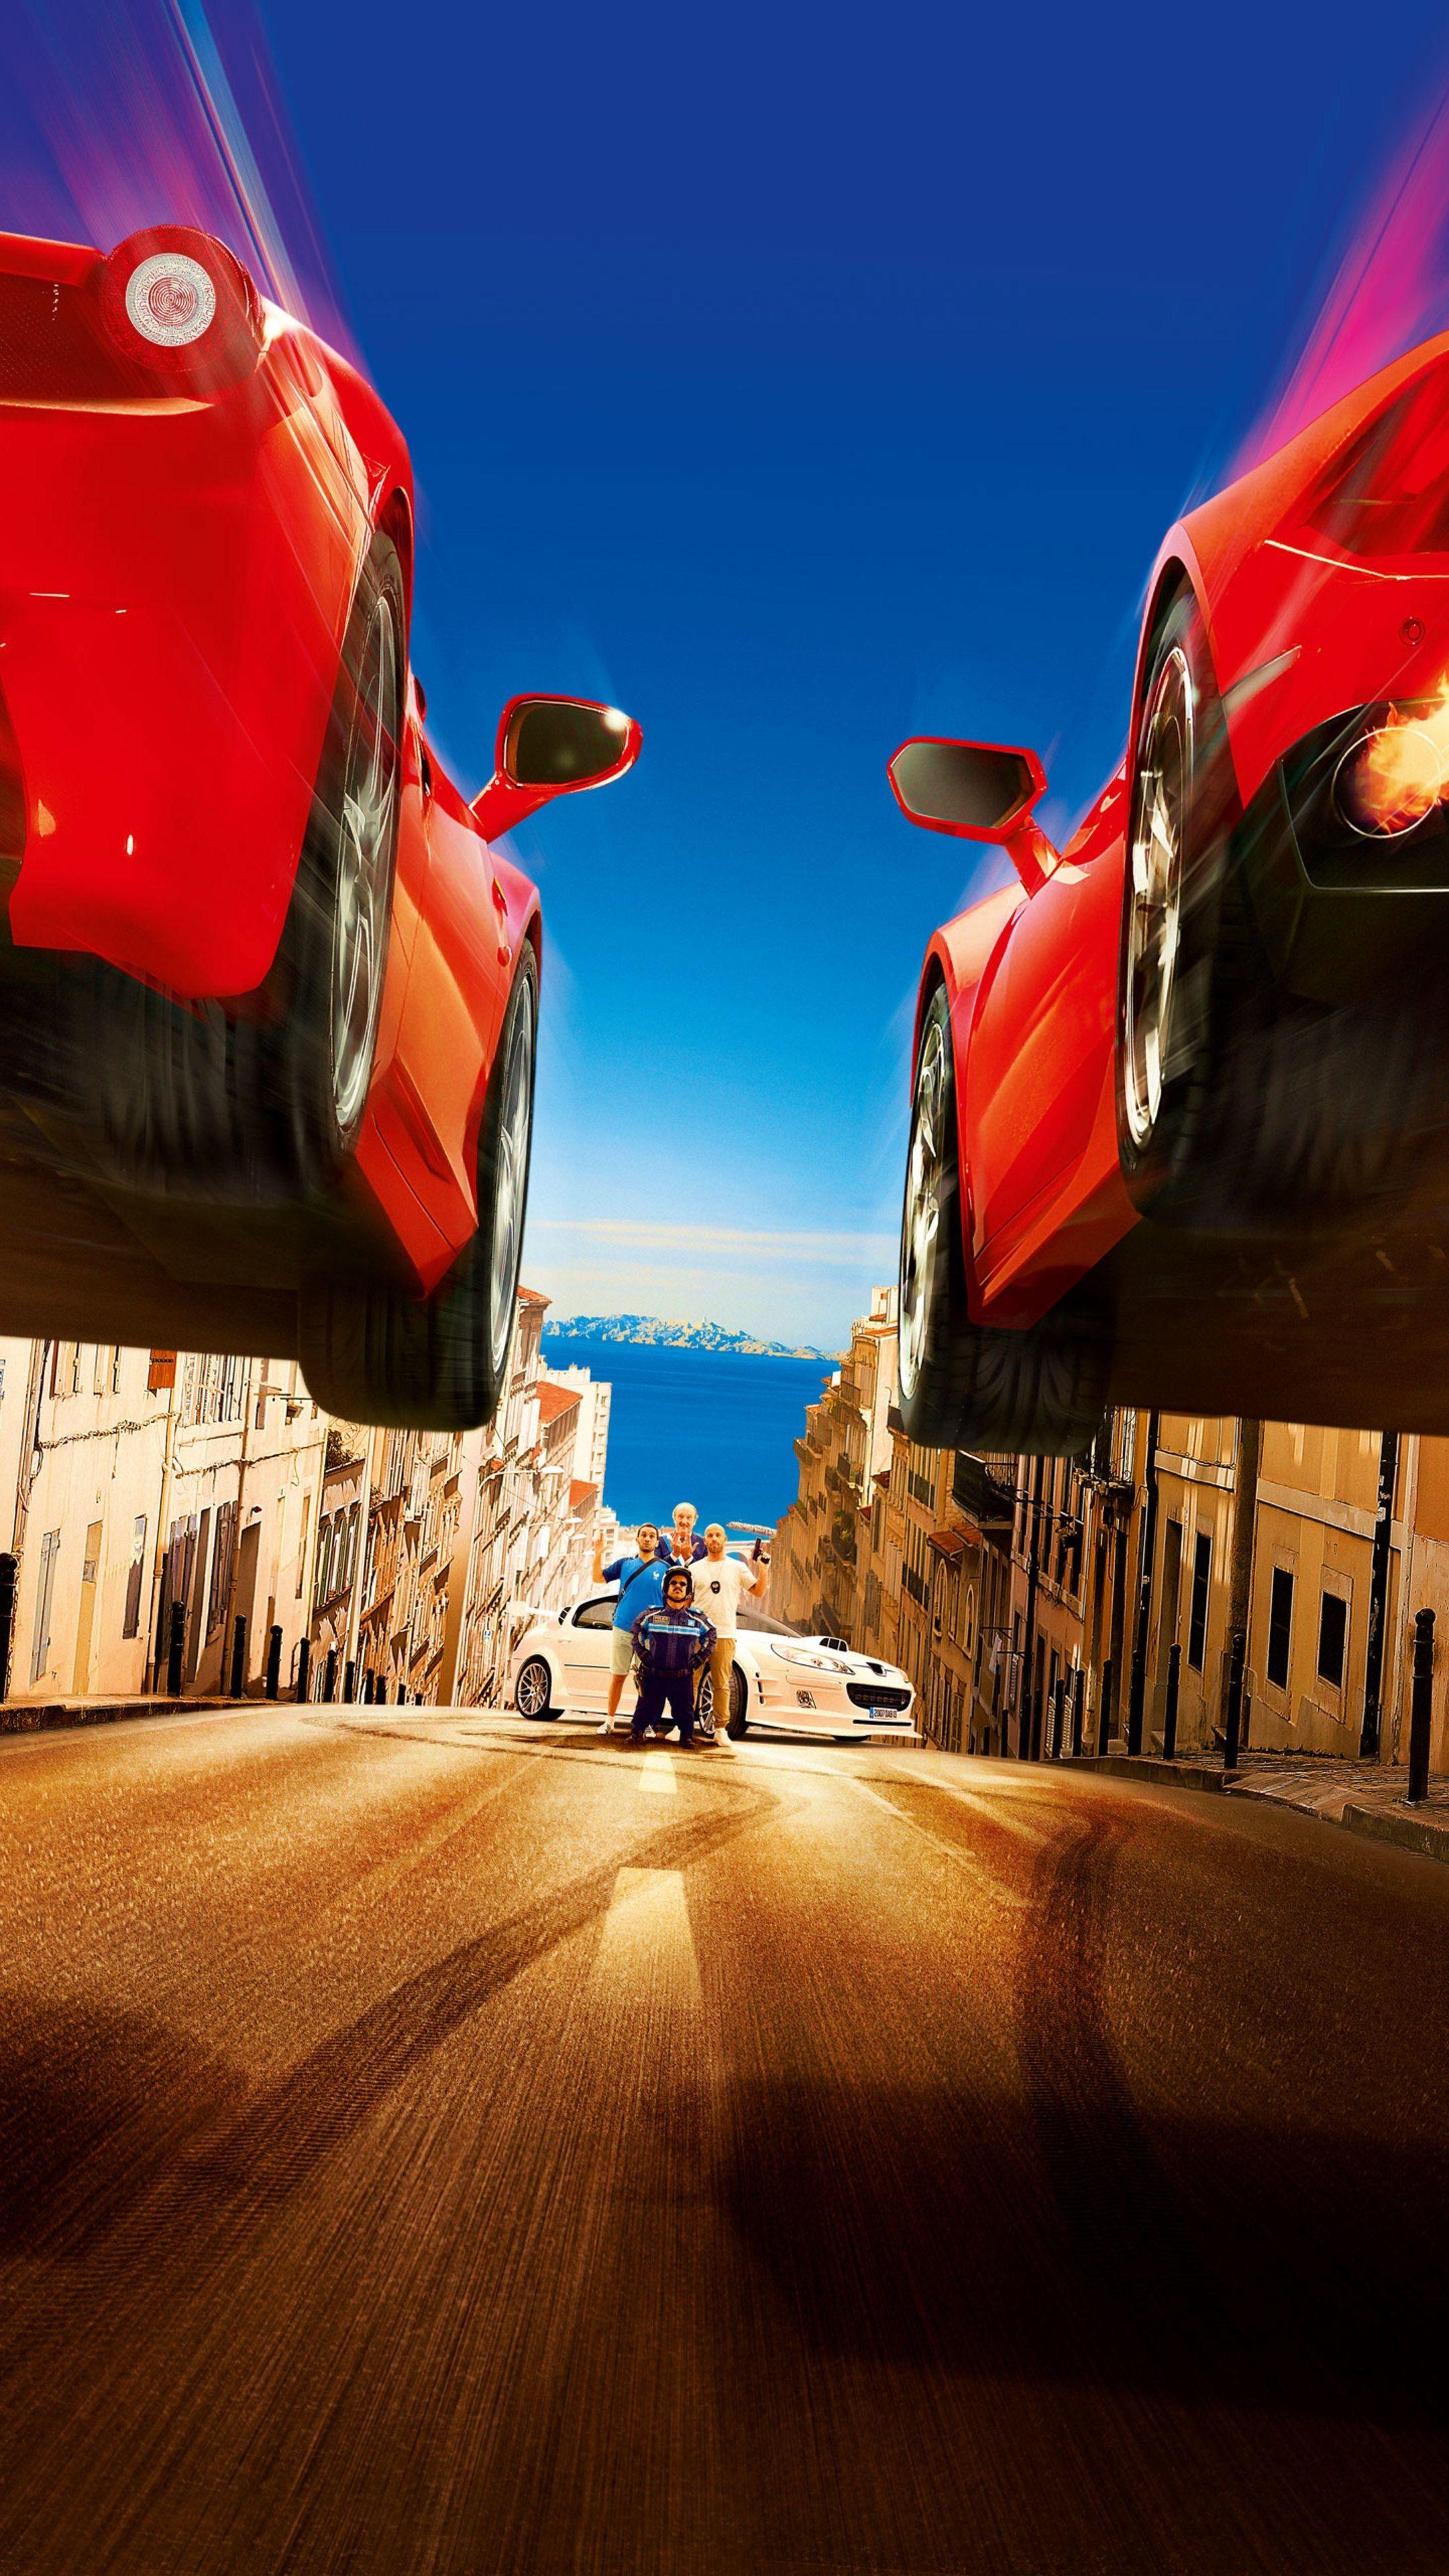 Taxi 5 Le Film En Entier En Francais Check more at https